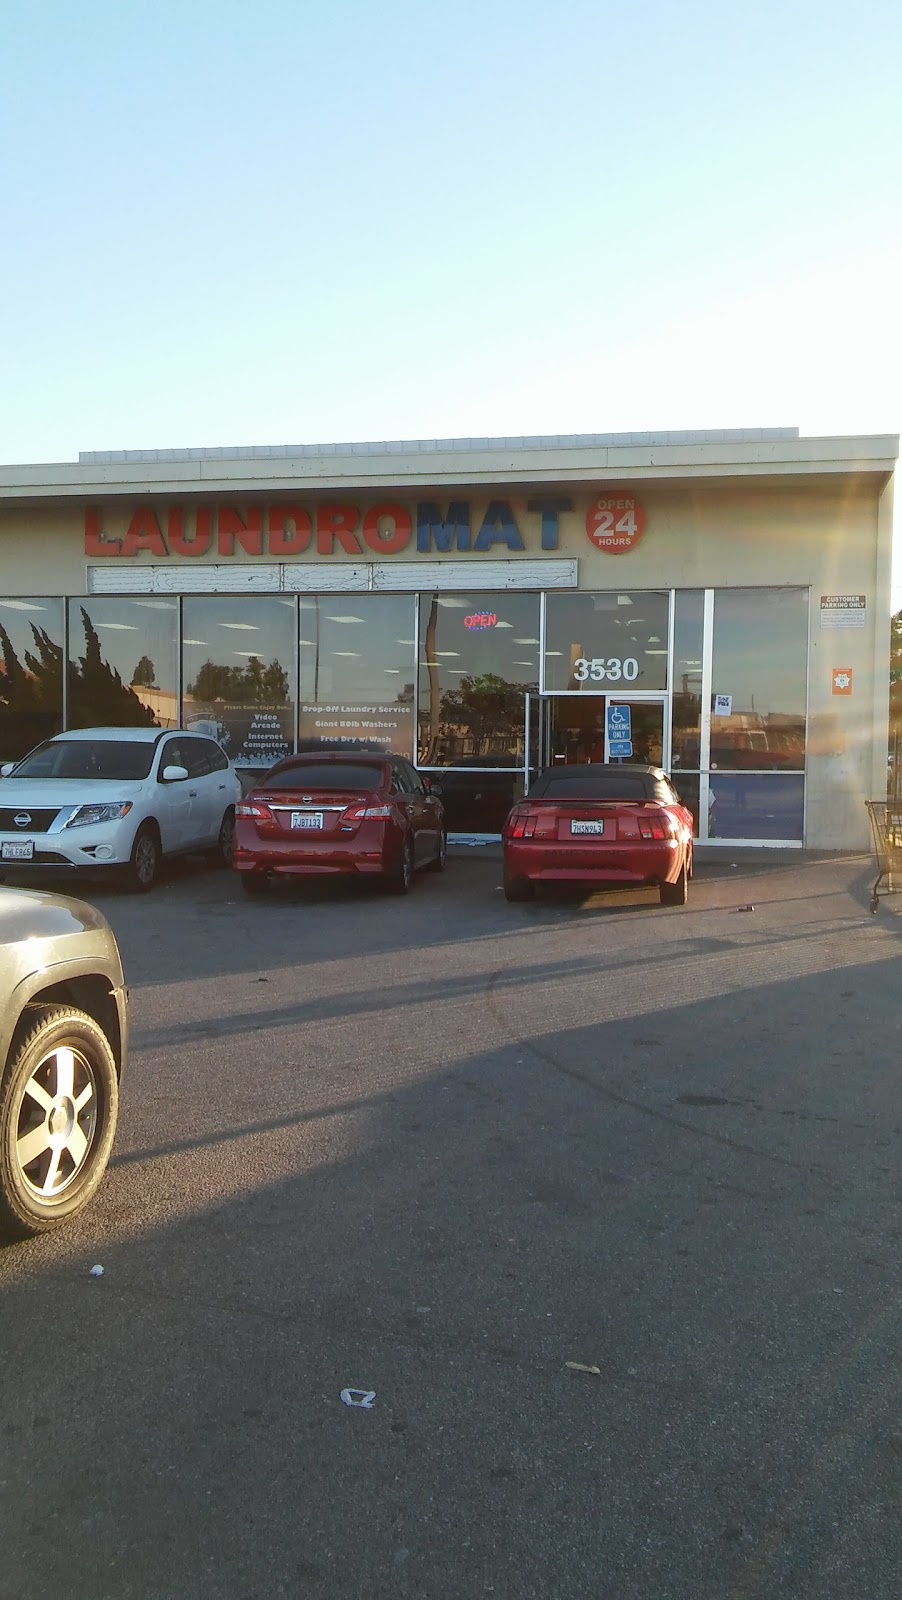 Top Spin Laundromat - laundry  | Photo 7 of 7 | Address: 3530 Saviers Rd, Oxnard, CA 93033, USA | Phone: (805) 486-5036